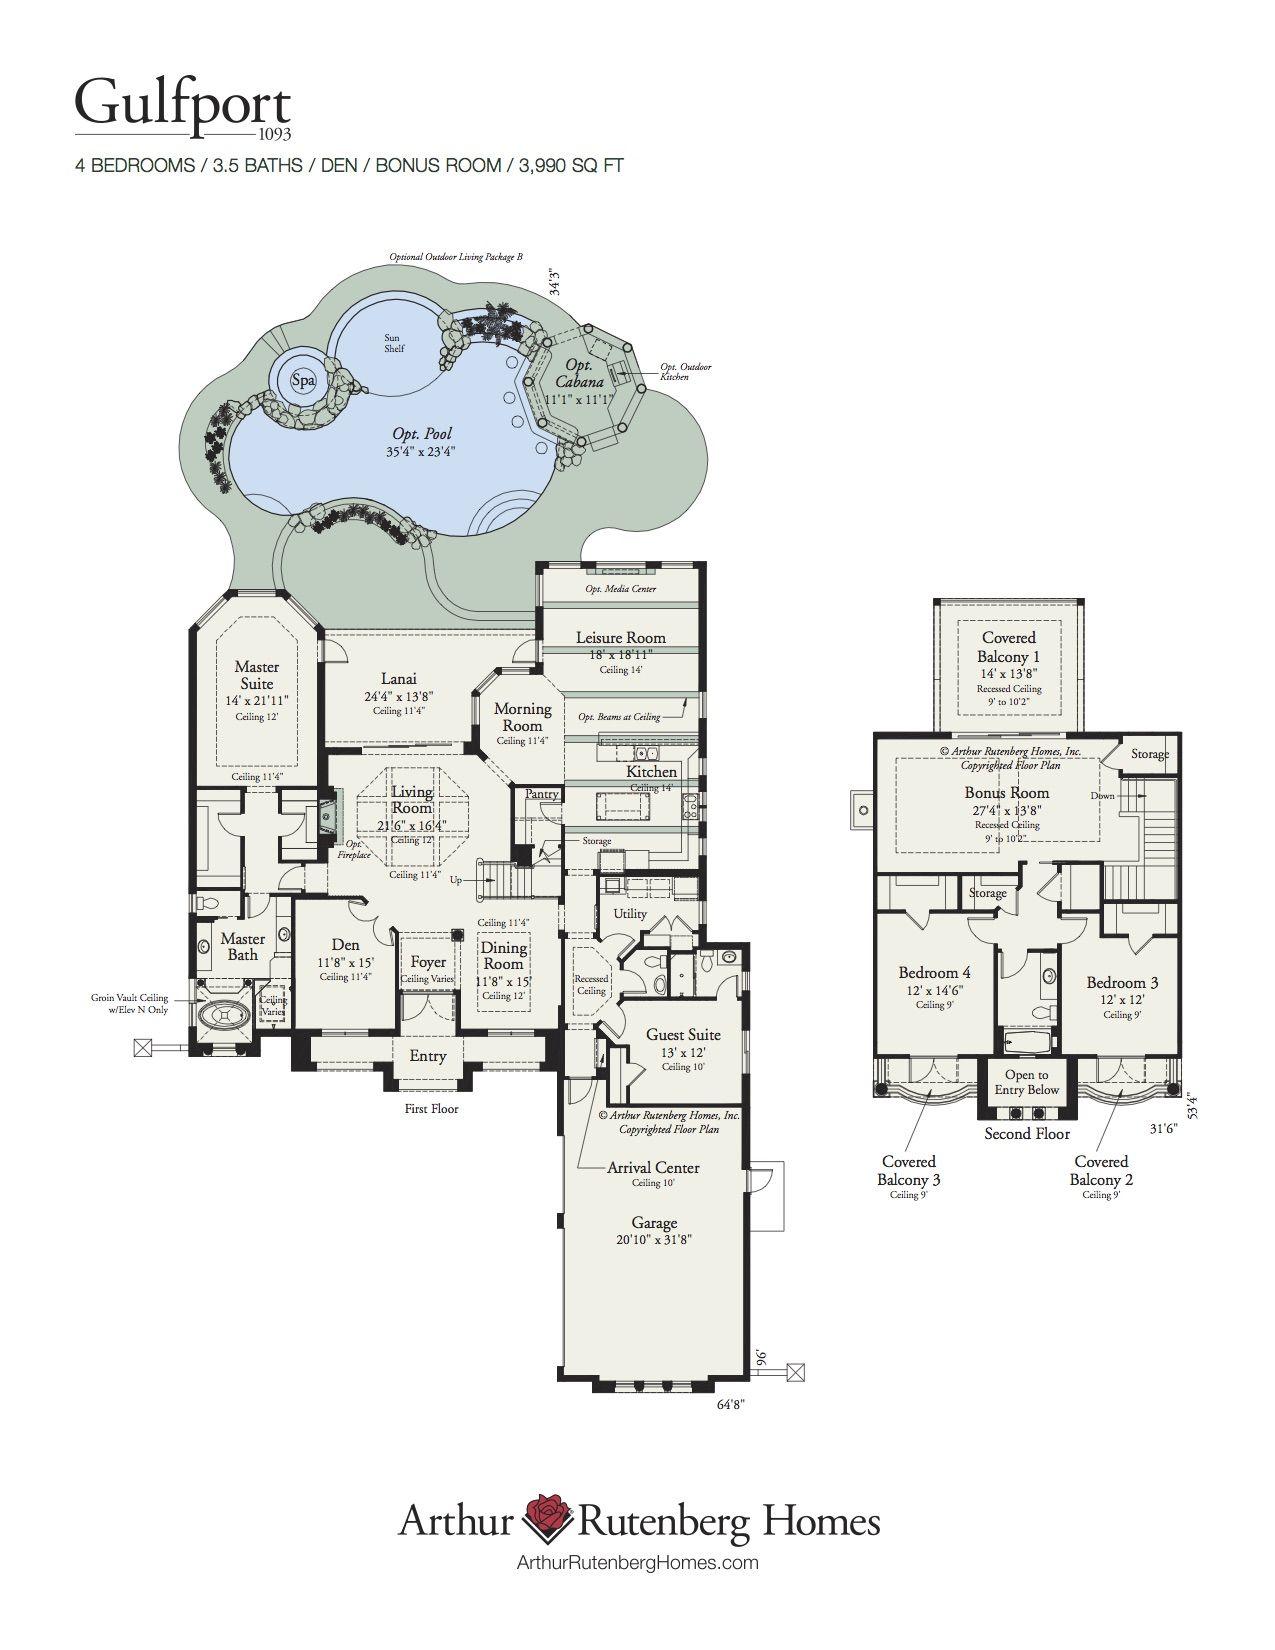 Arthur Rutenberg Homes Custom Home Design Living Area 3990 Sf